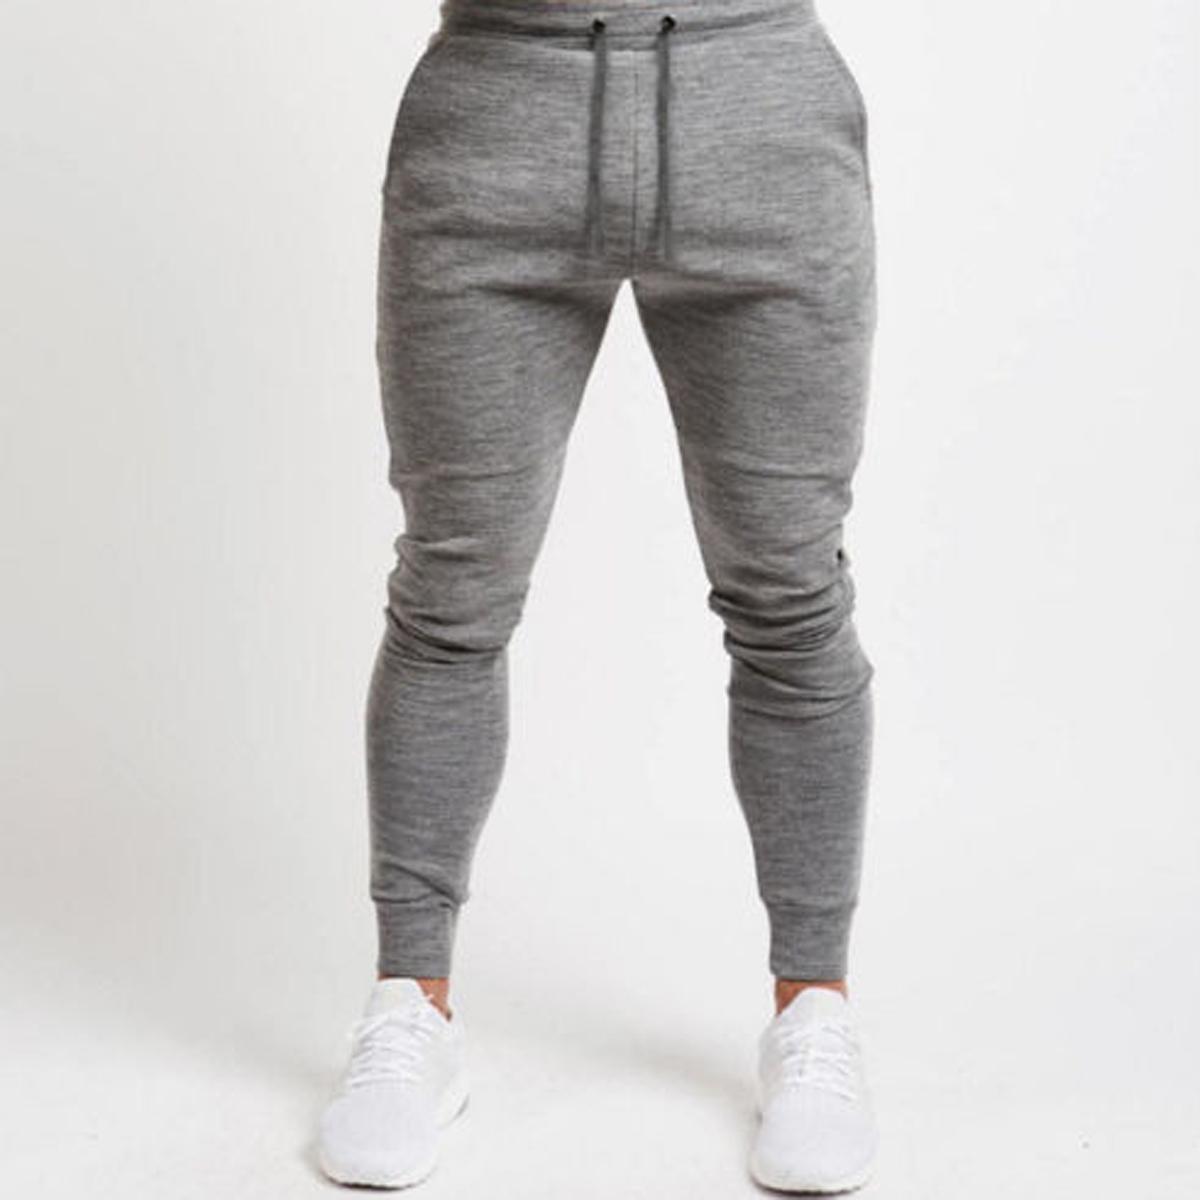 New Fashion Men Sportswear Skinny Running-wear Bottoms Slim Fit Jogger Slack Casual Man's Pants Waist Elastic Trouser